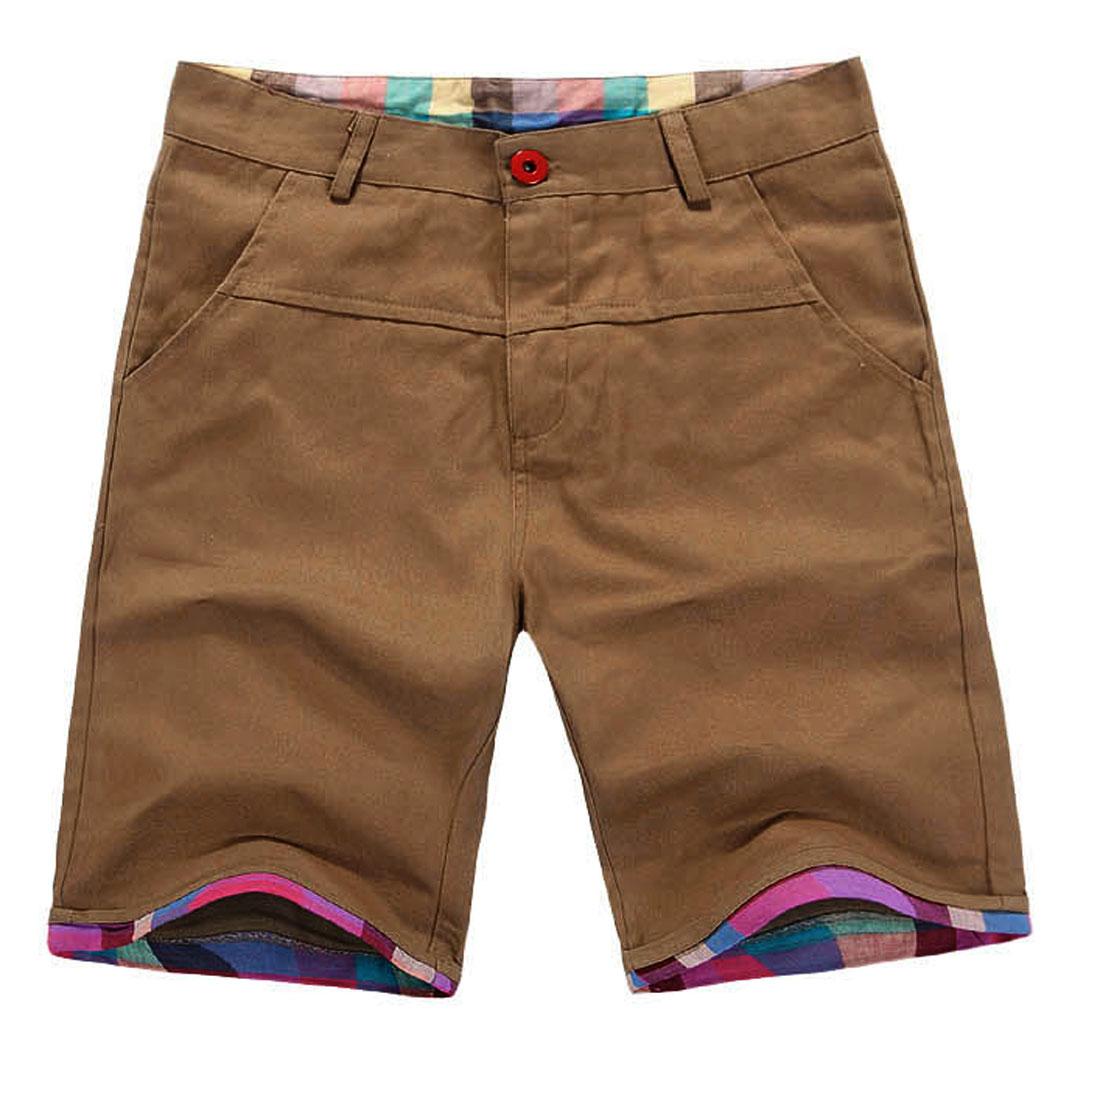 Men Buttoned Zipped Closure Roll Up Hem Plaids Prints Decor Detail Shorts Light Brown W32